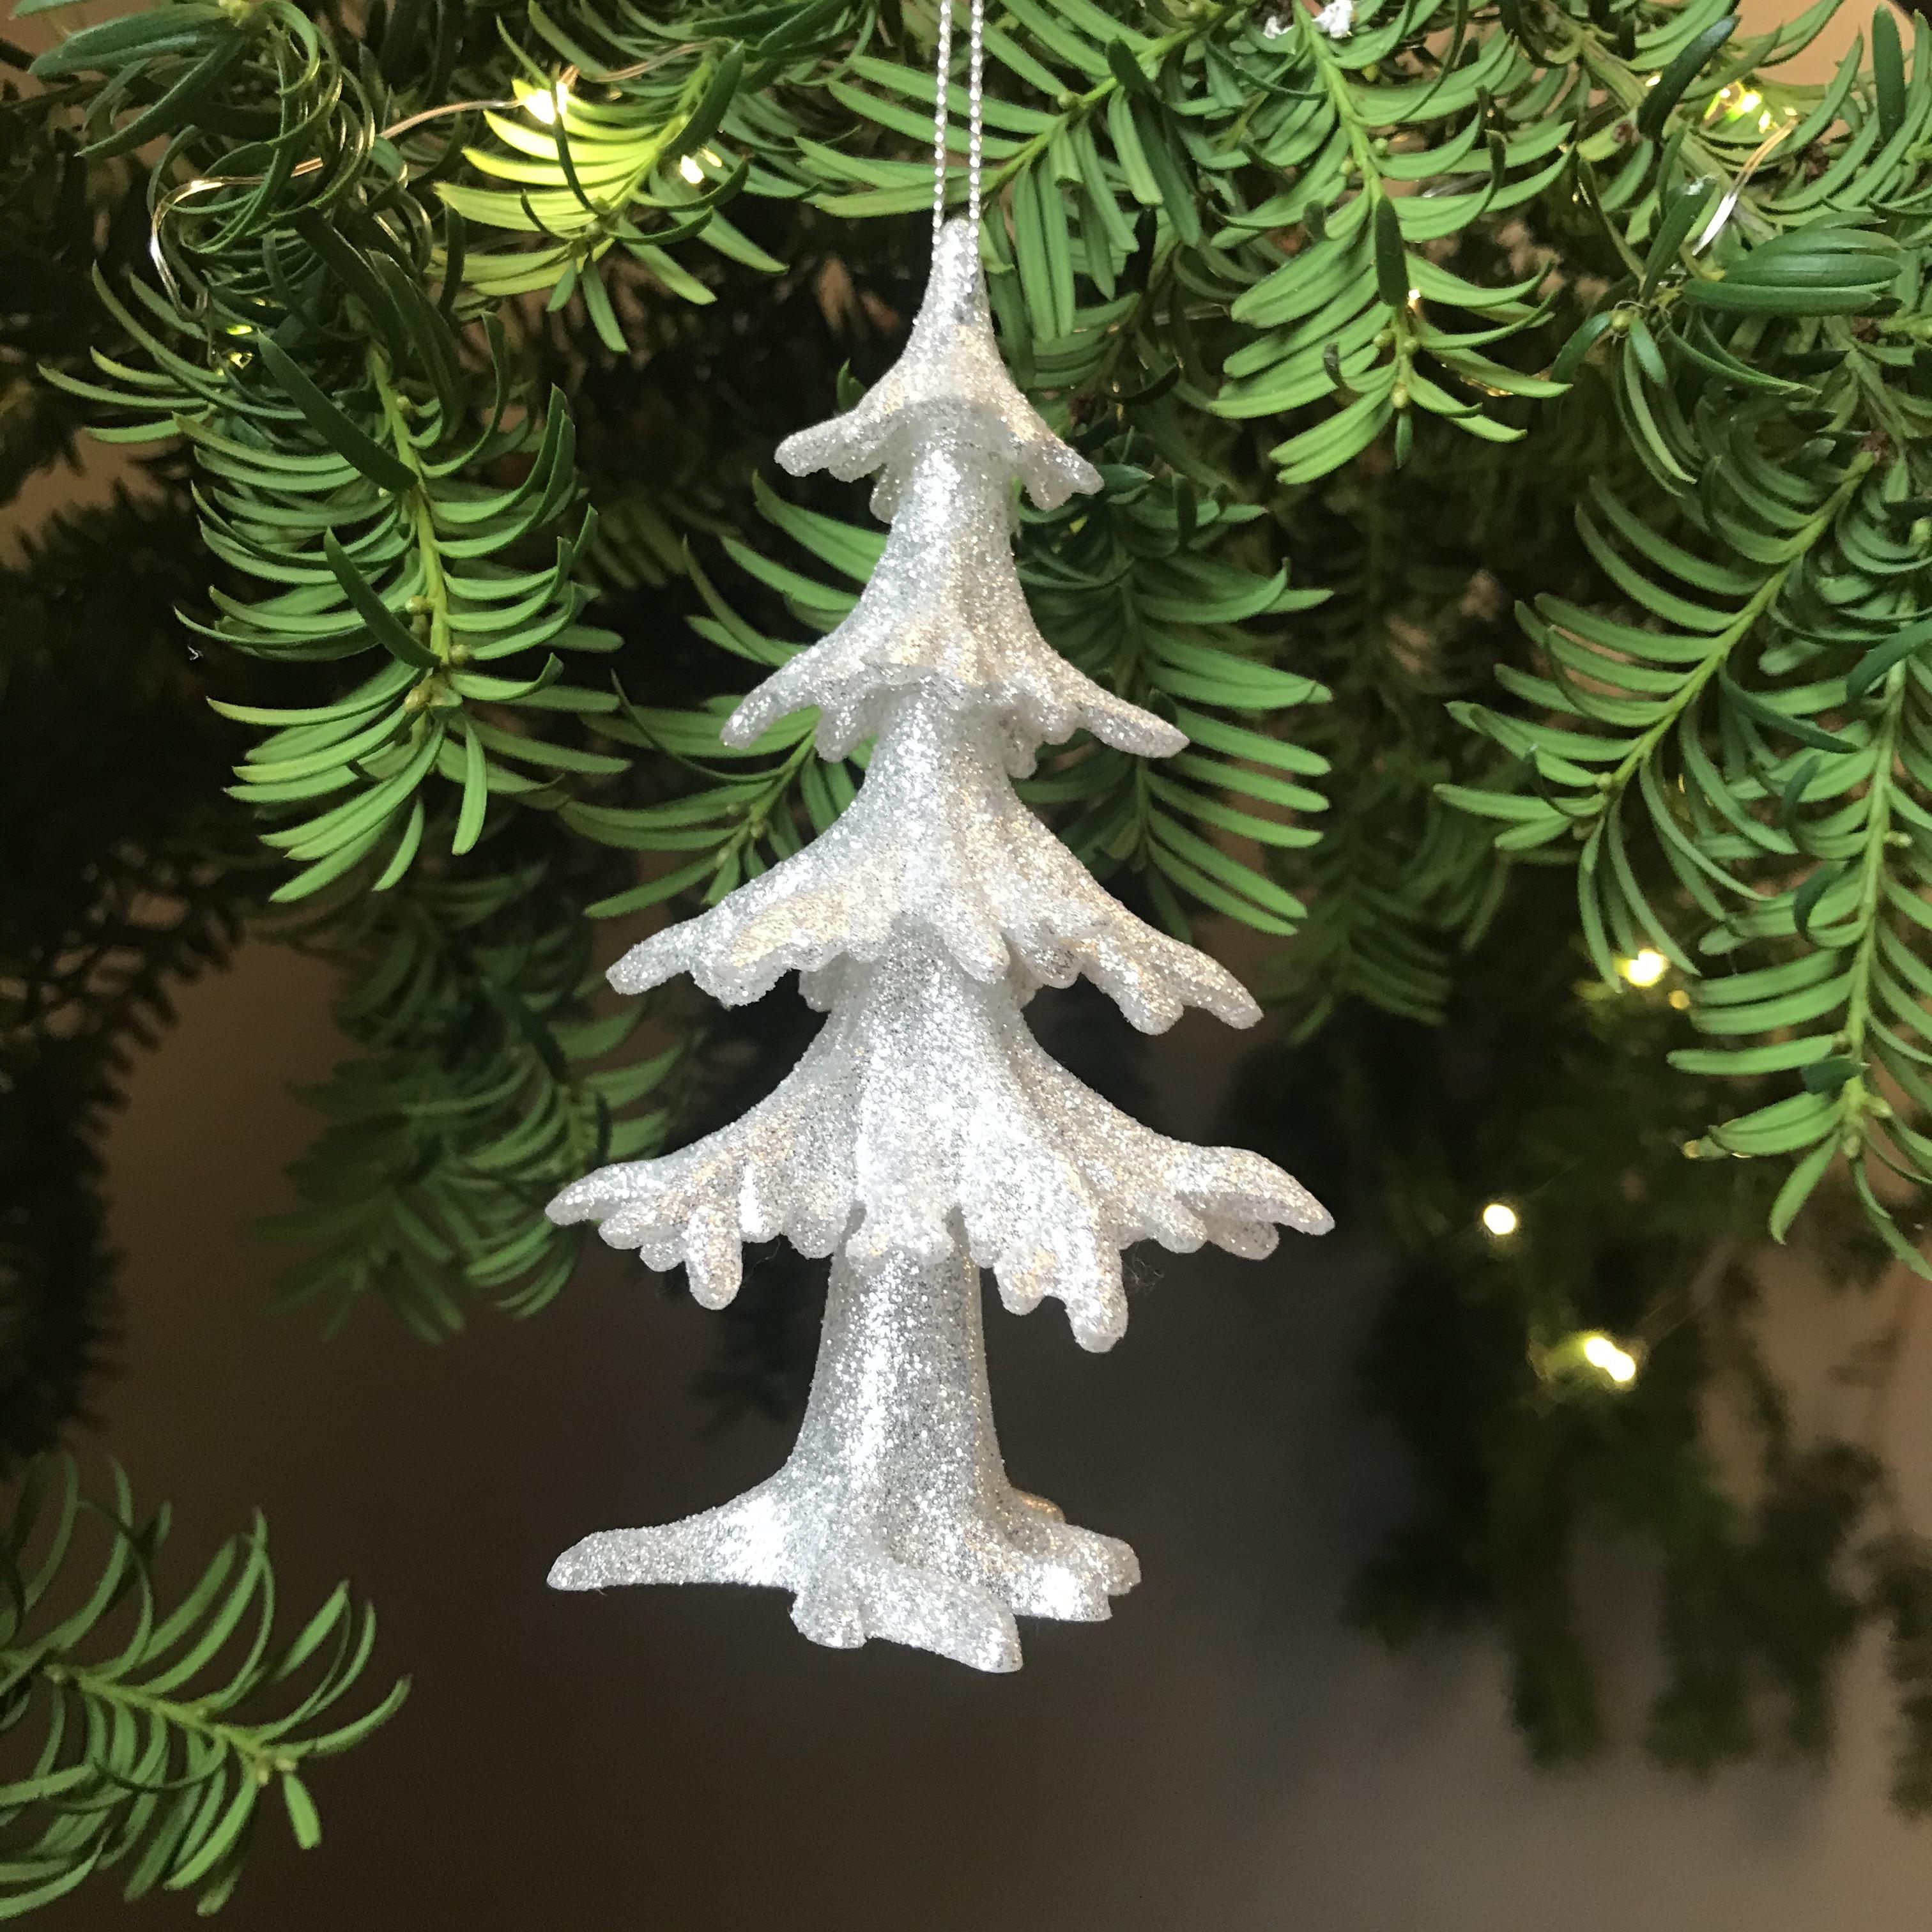 3D Silver Glitter Tree Decoration - was £3.50